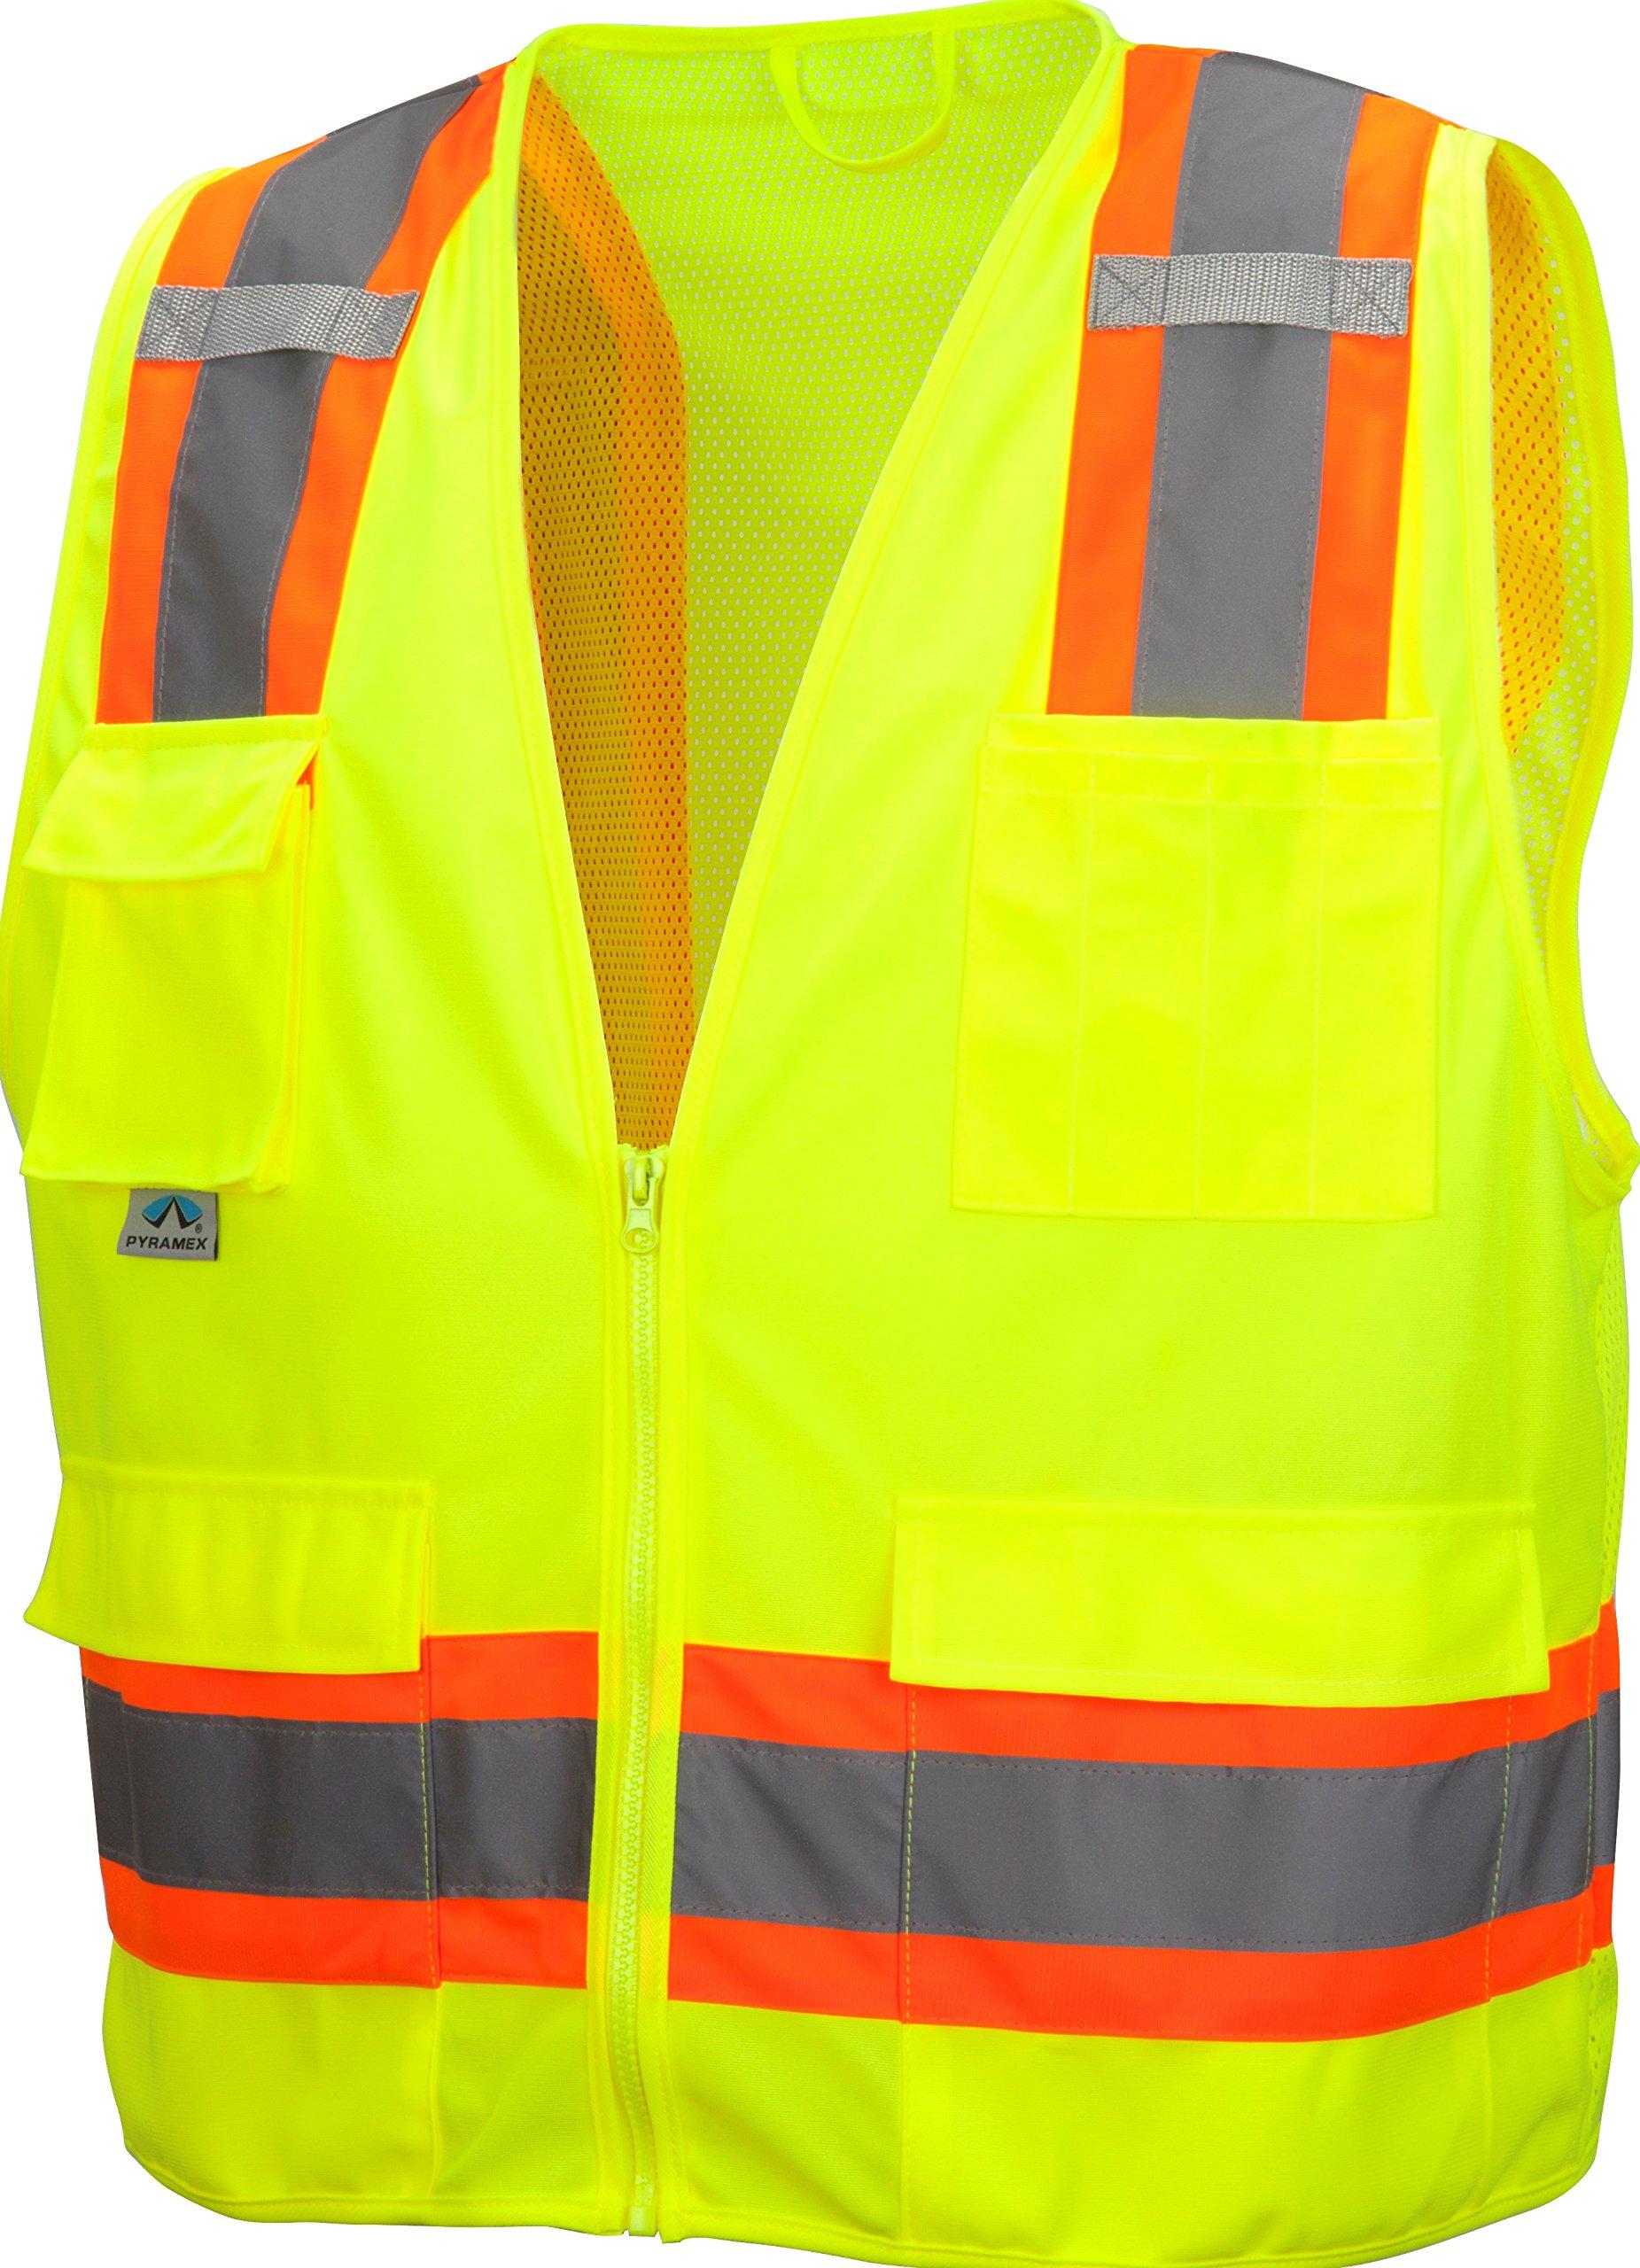 Pyramex RVZ2410SEX5 Lumen X Class 2 Self-Extinguishing Surveyor's Safety Vest, 5X-Large, Hi-Vis Lime